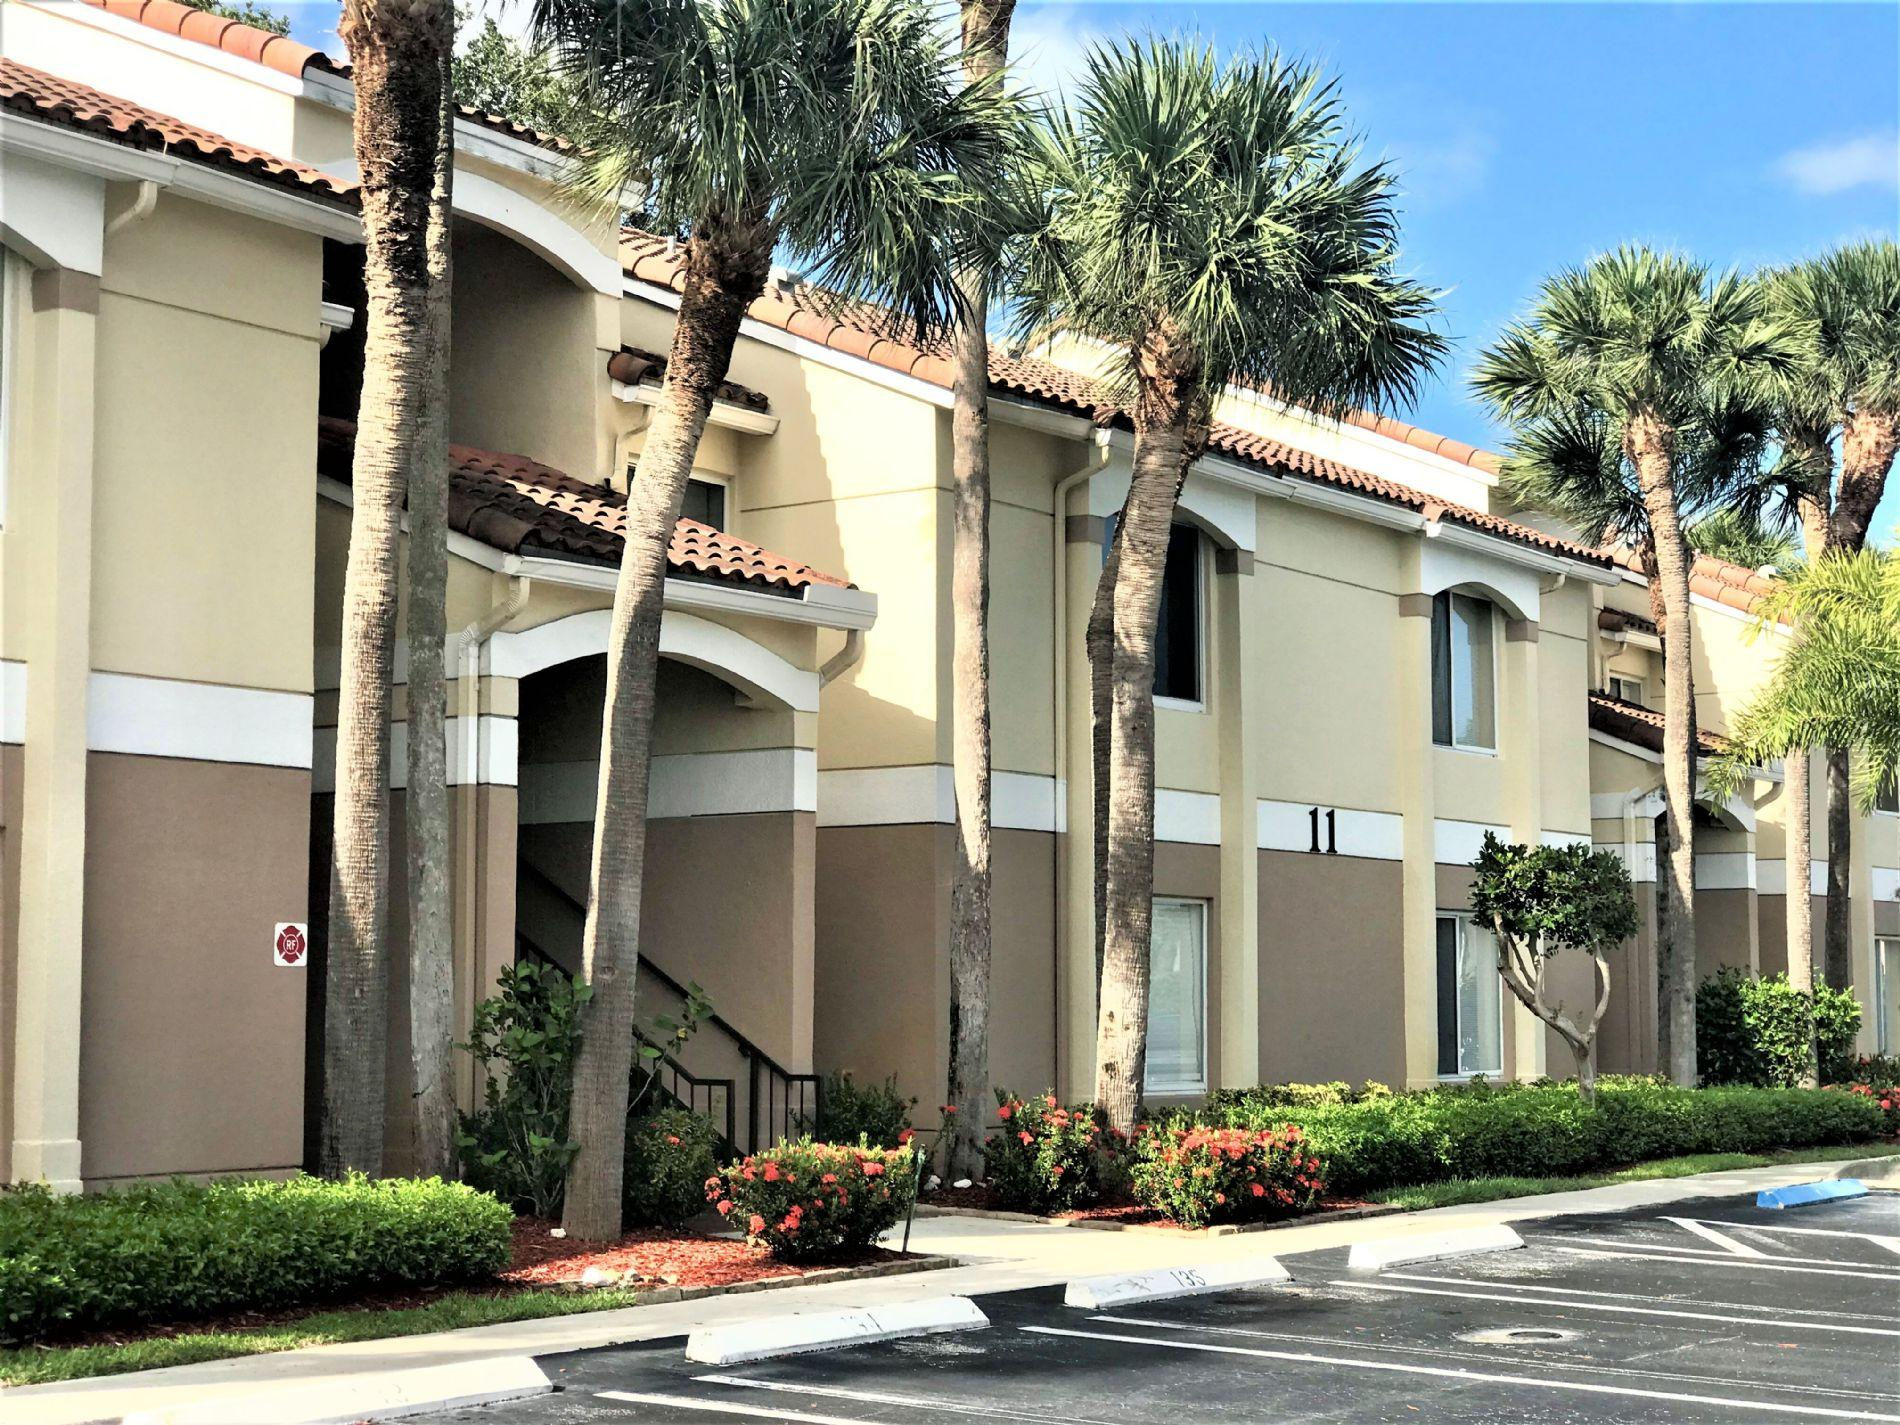 815 W Boynton Beach Boulevard 11-104 Boynton Beach, FL 33426